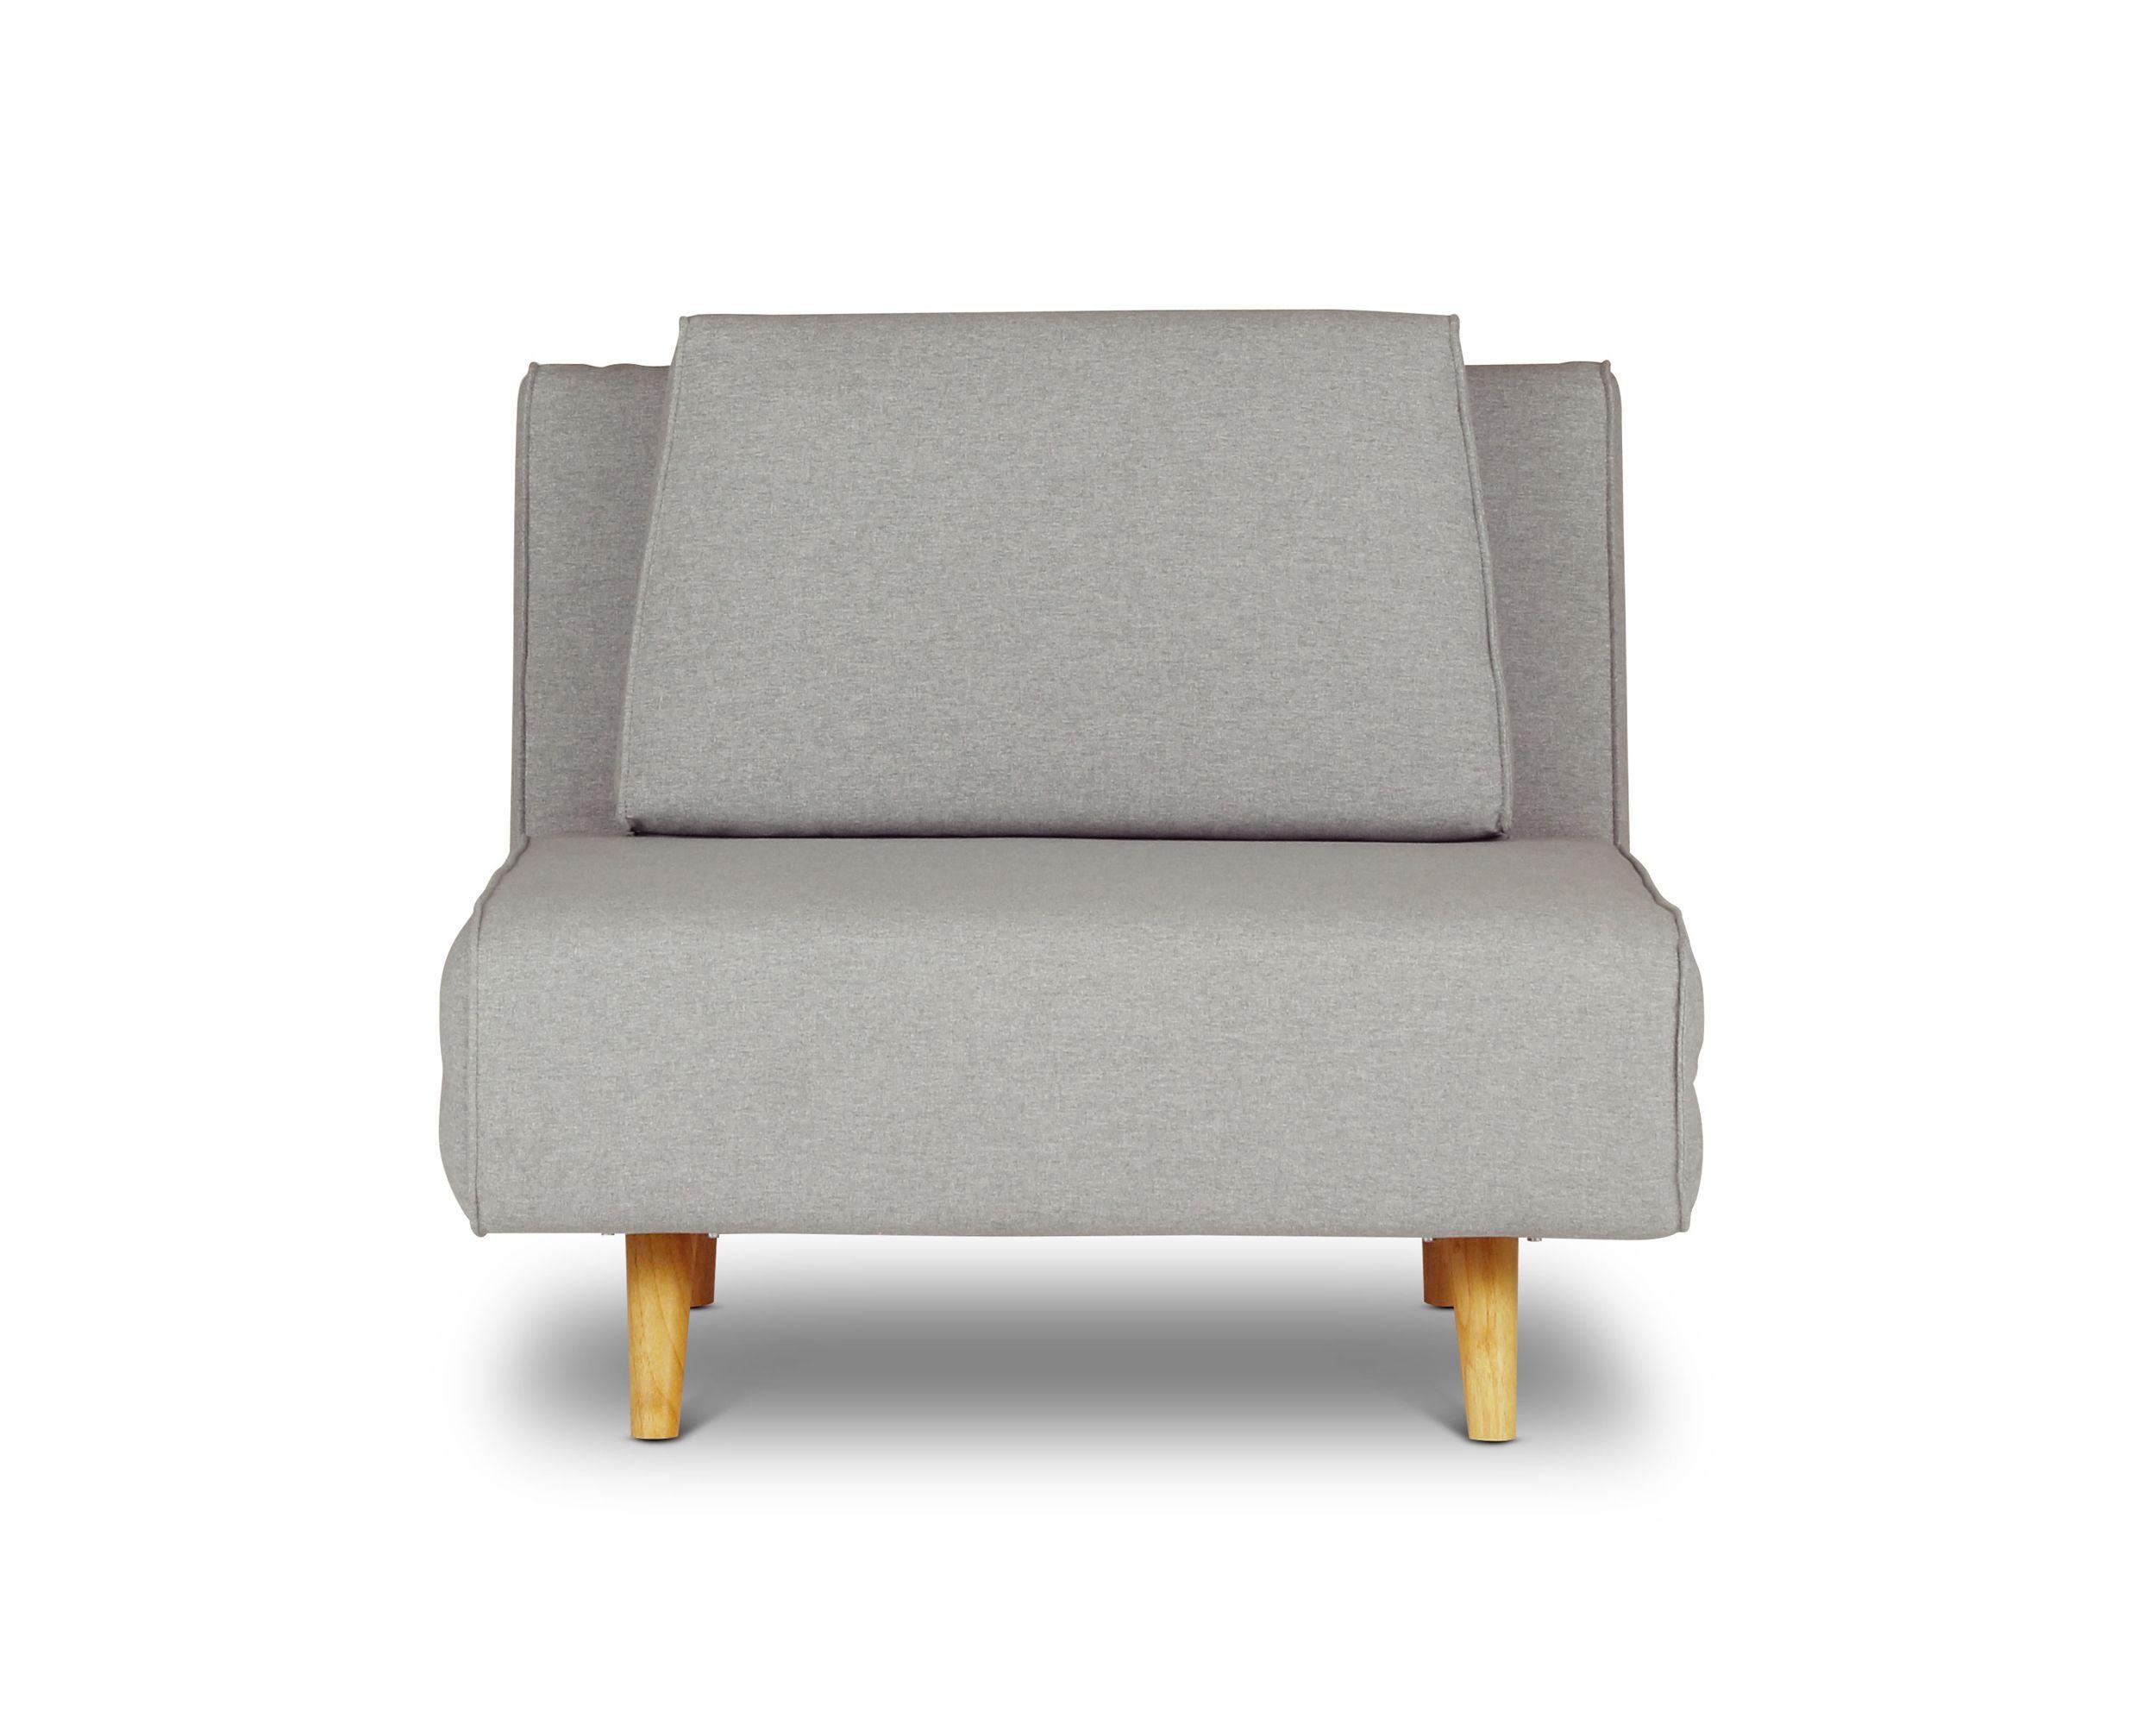 Hana Armchair Sofa Bed Lounge Lovers Sofa Bed Design Comfortable Sofa Bed Chair Sofa Bed